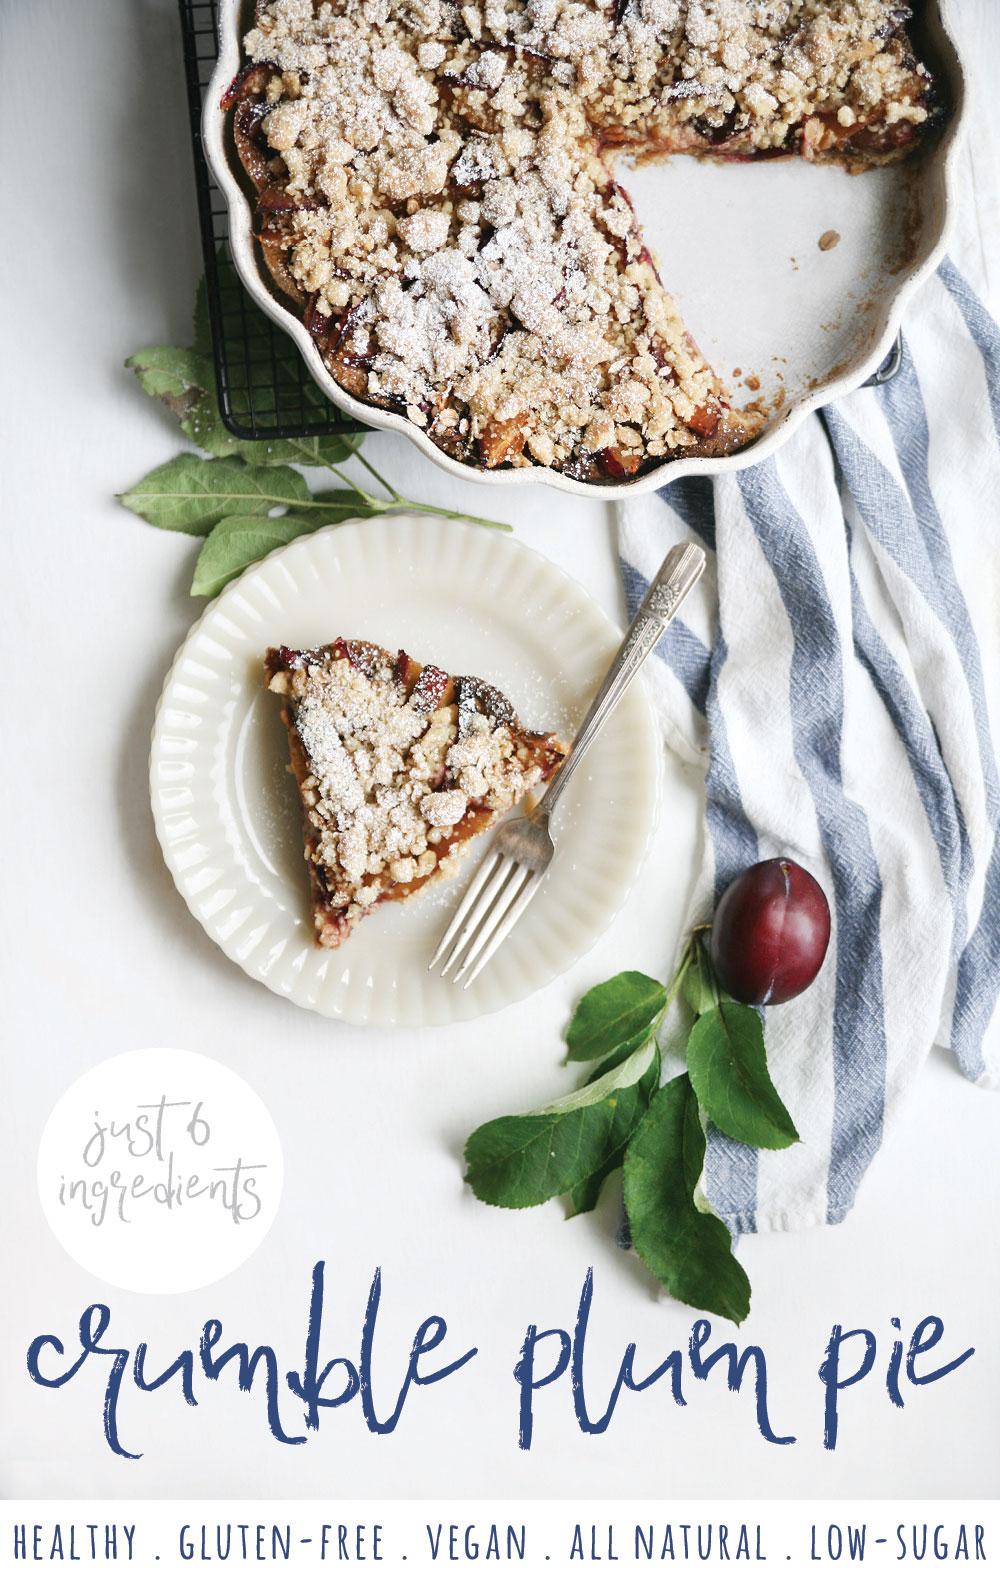 Gluten-Free-Crumble-Plum-Pie-Pure-Ella-Leche9